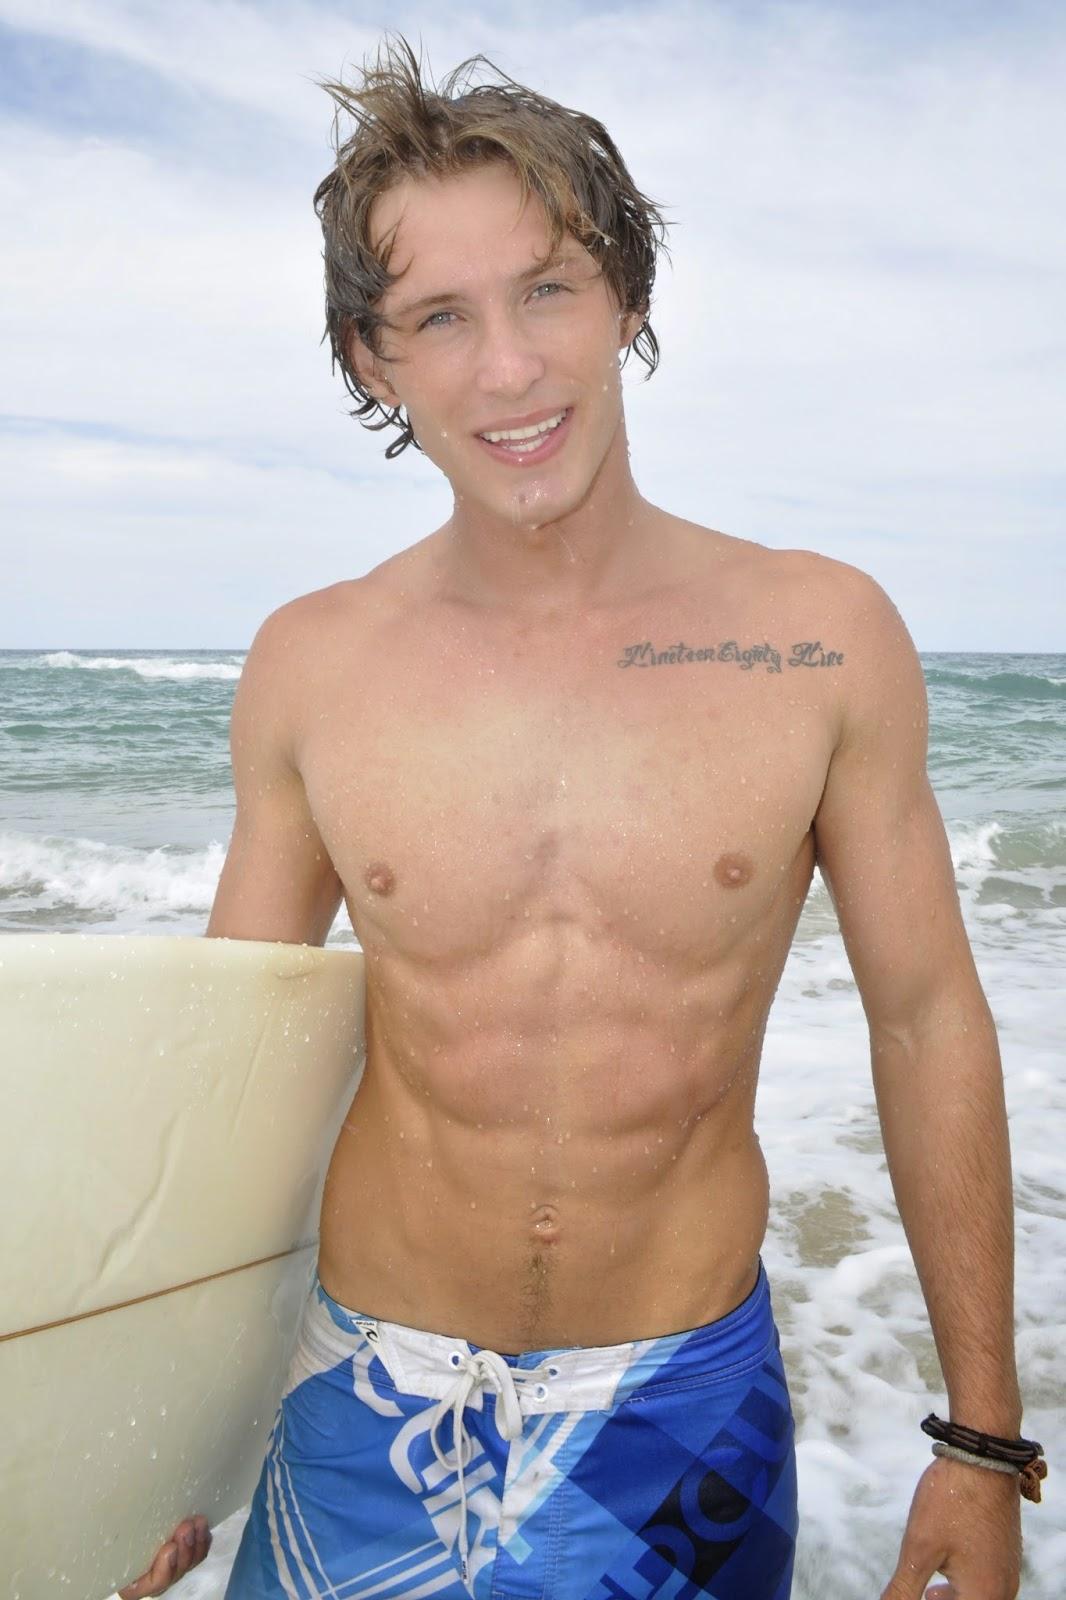 All Australian Boys all australian boys: can this body be any hotter?